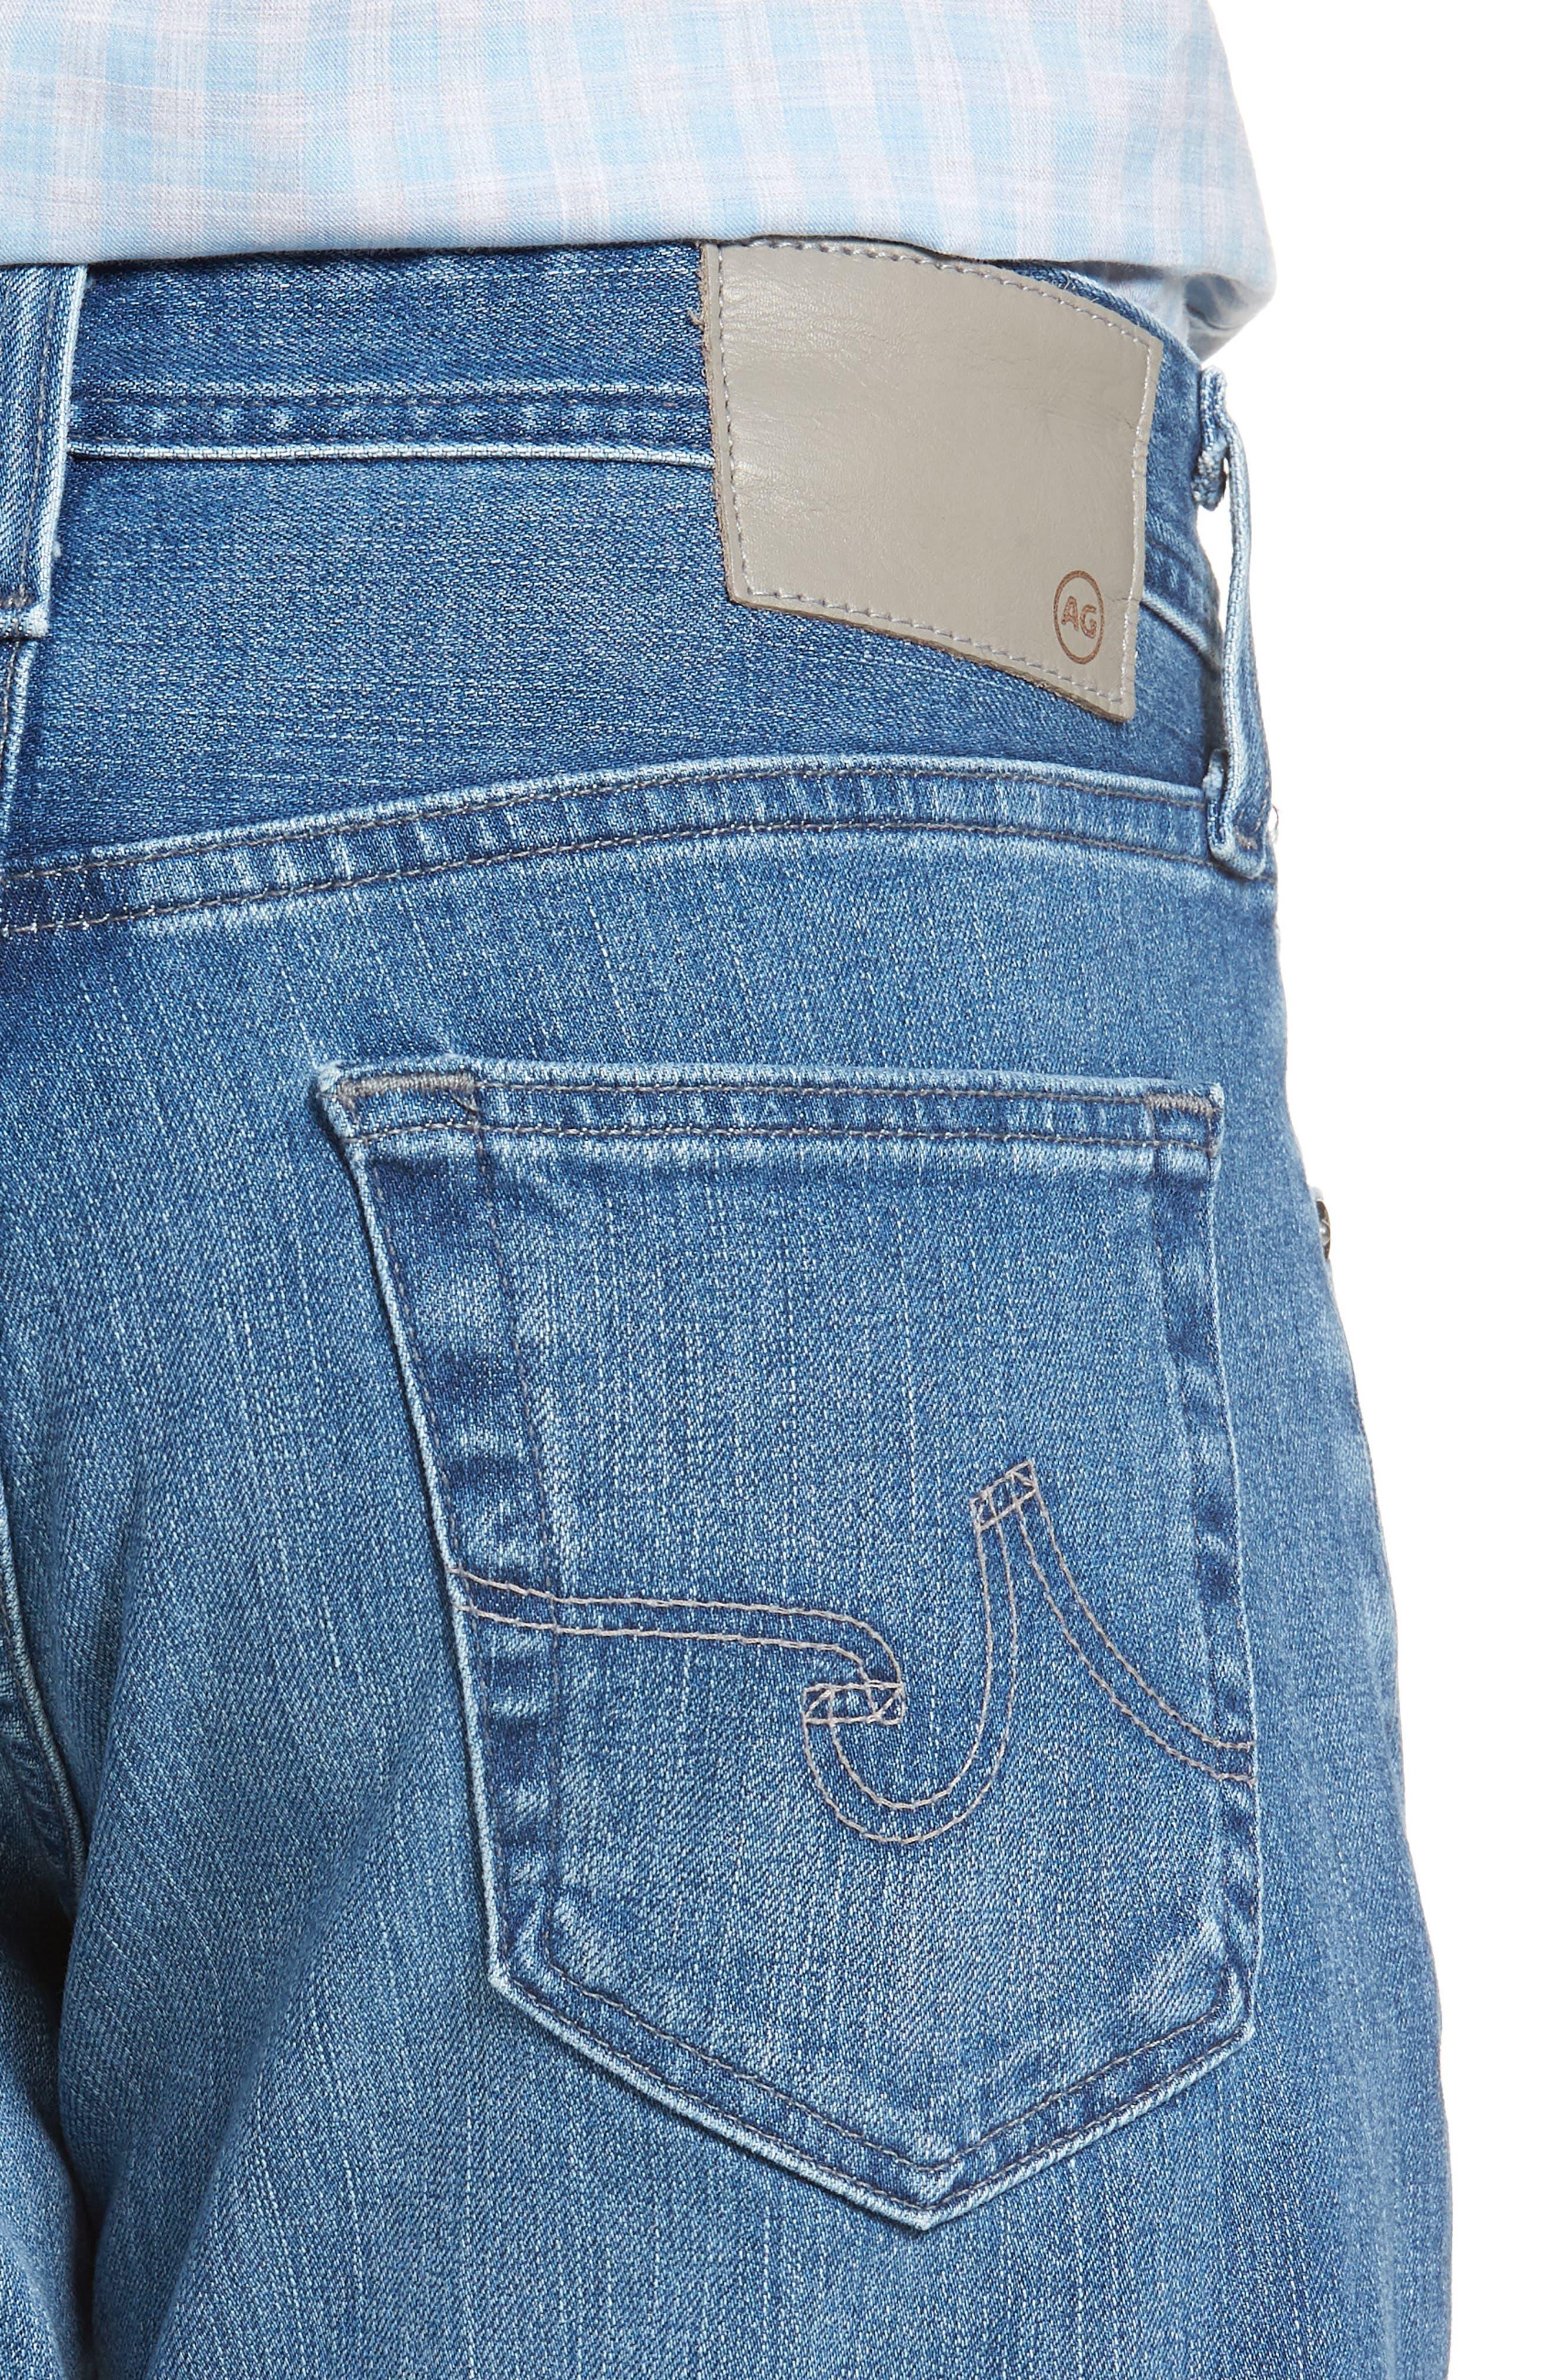 Graduate Slim Straight Leg Jeans,                             Alternate thumbnail 4, color,                             DEMOLITION